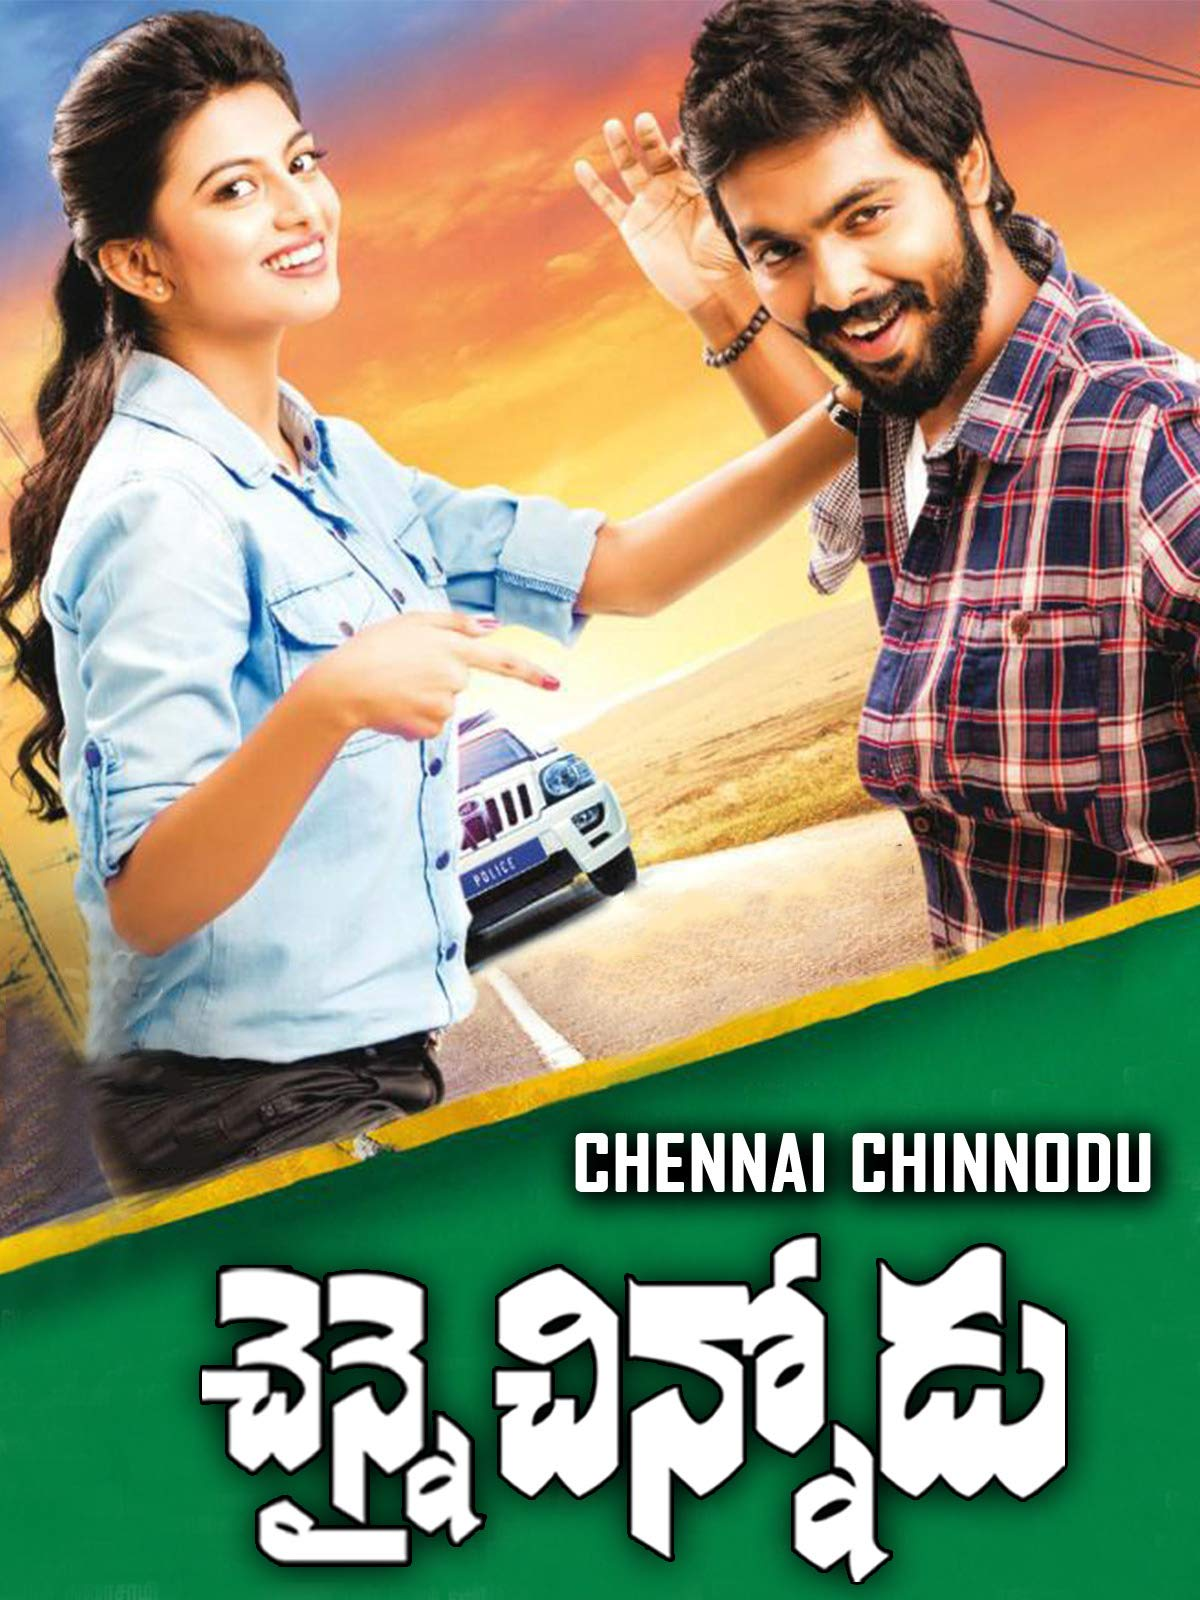 Chennai Chinnodu